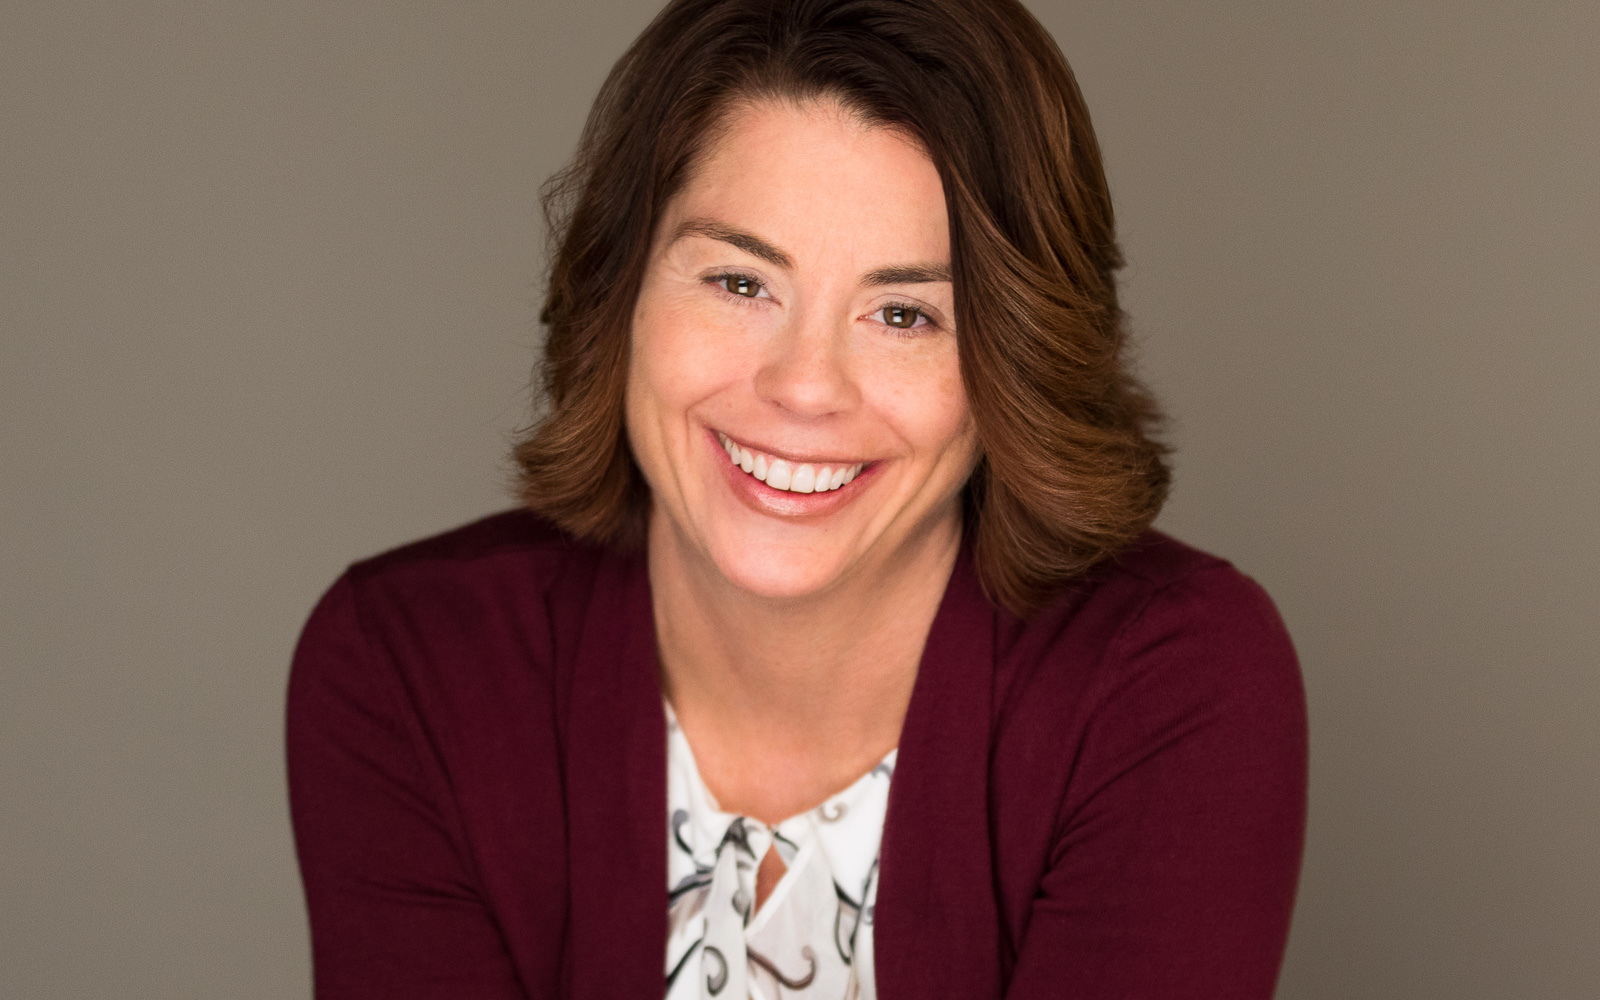 Olive Juice Studios - Rochester Minnesota Headshot and Business Portraits -